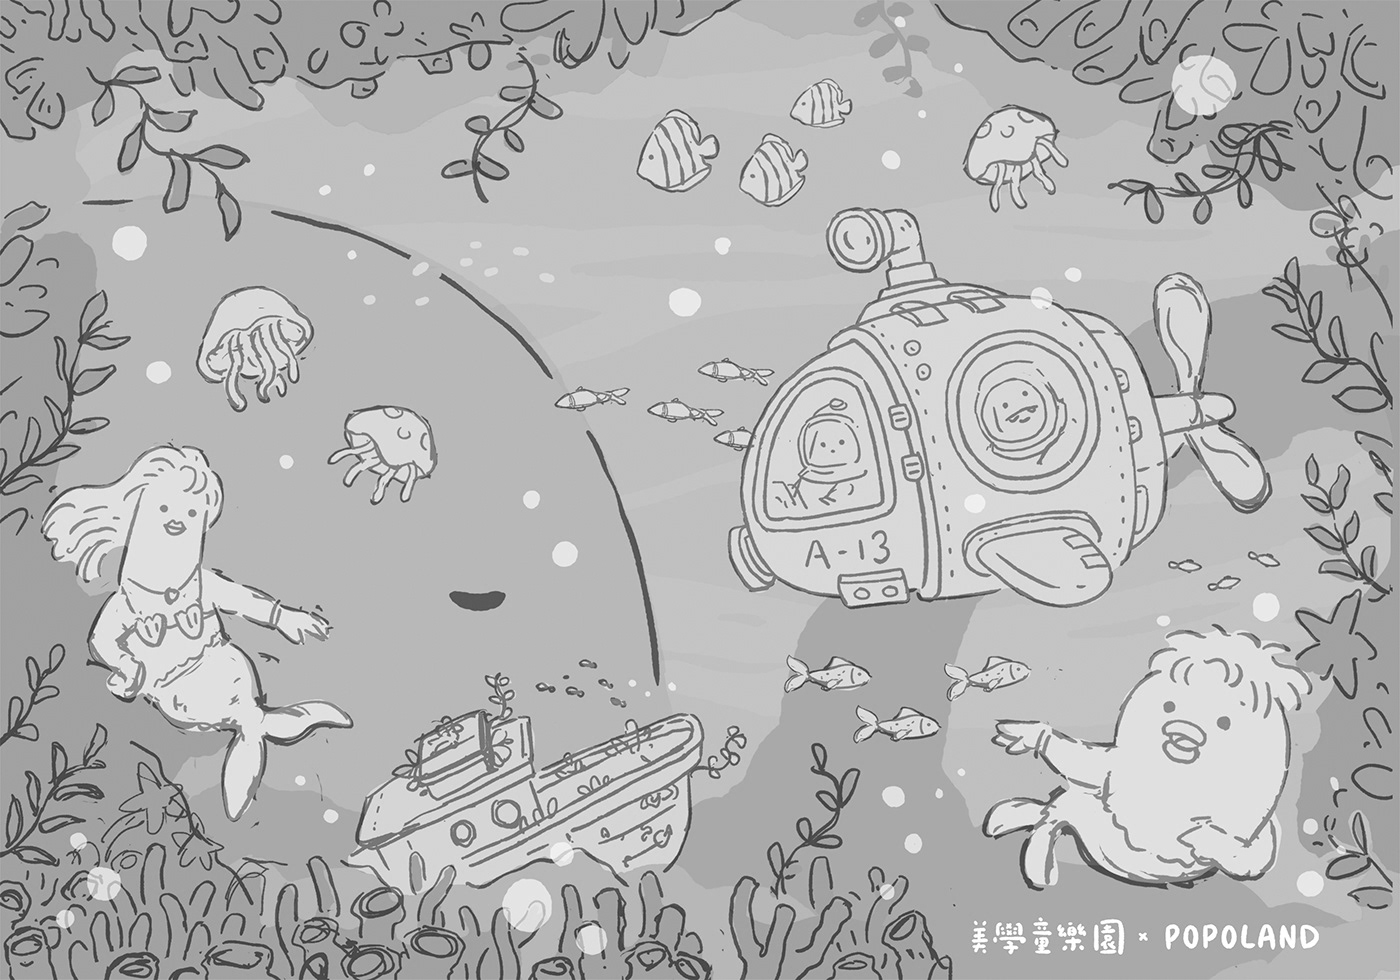 popoland 拼圖 插畫 波寶 波寶島 海底童樂園 海洋 牆面佈置 美學童樂園 遠百信義a13